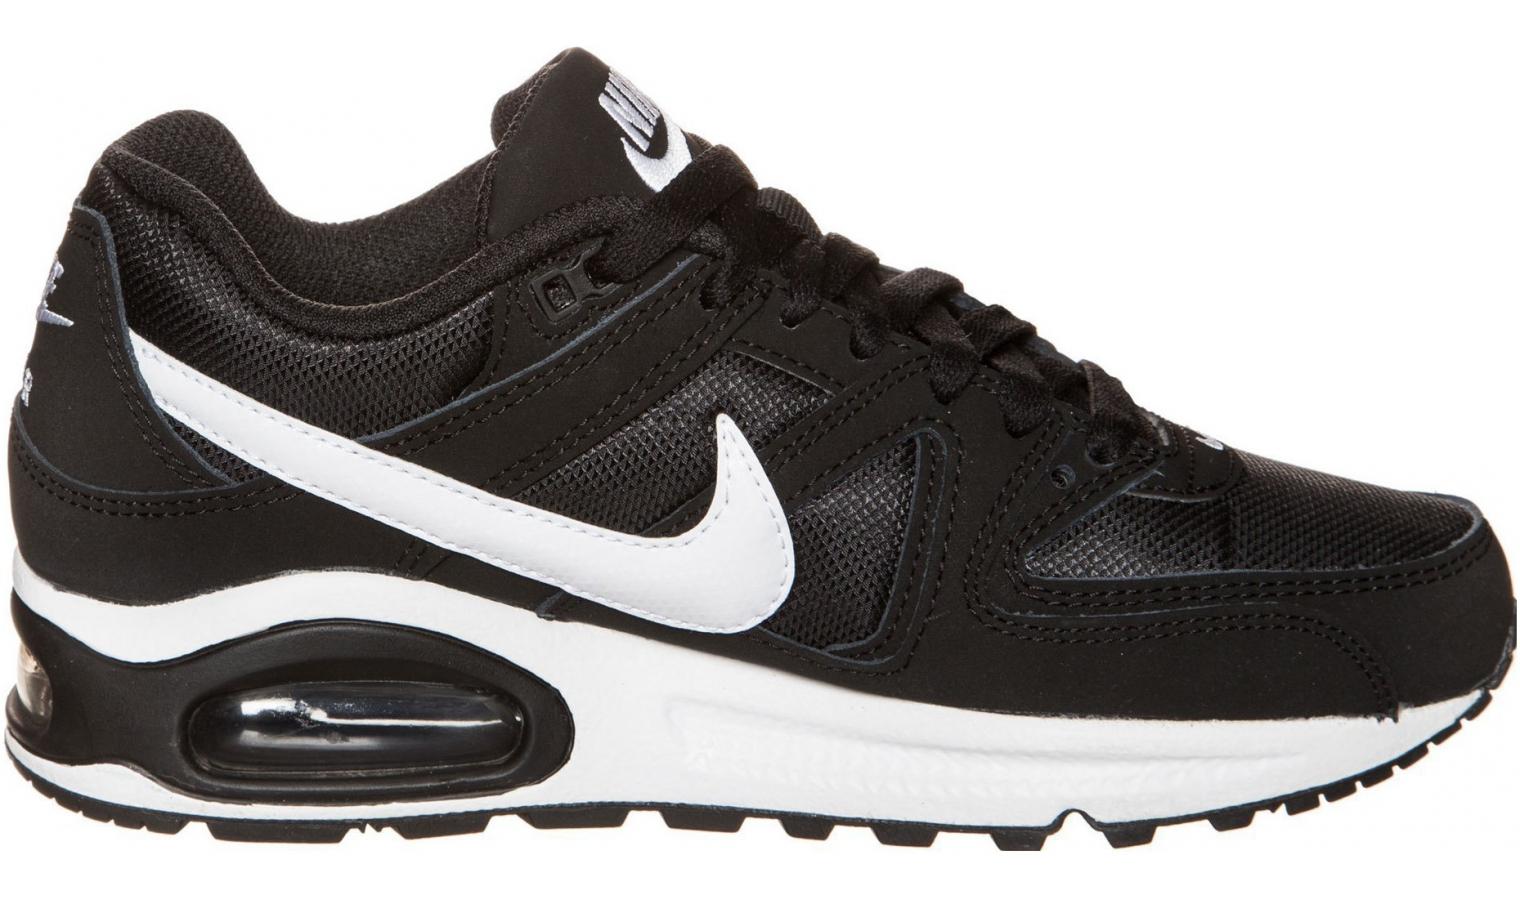 934a6bae81b Dámské boty Nike AIR MAX COMMAND černé